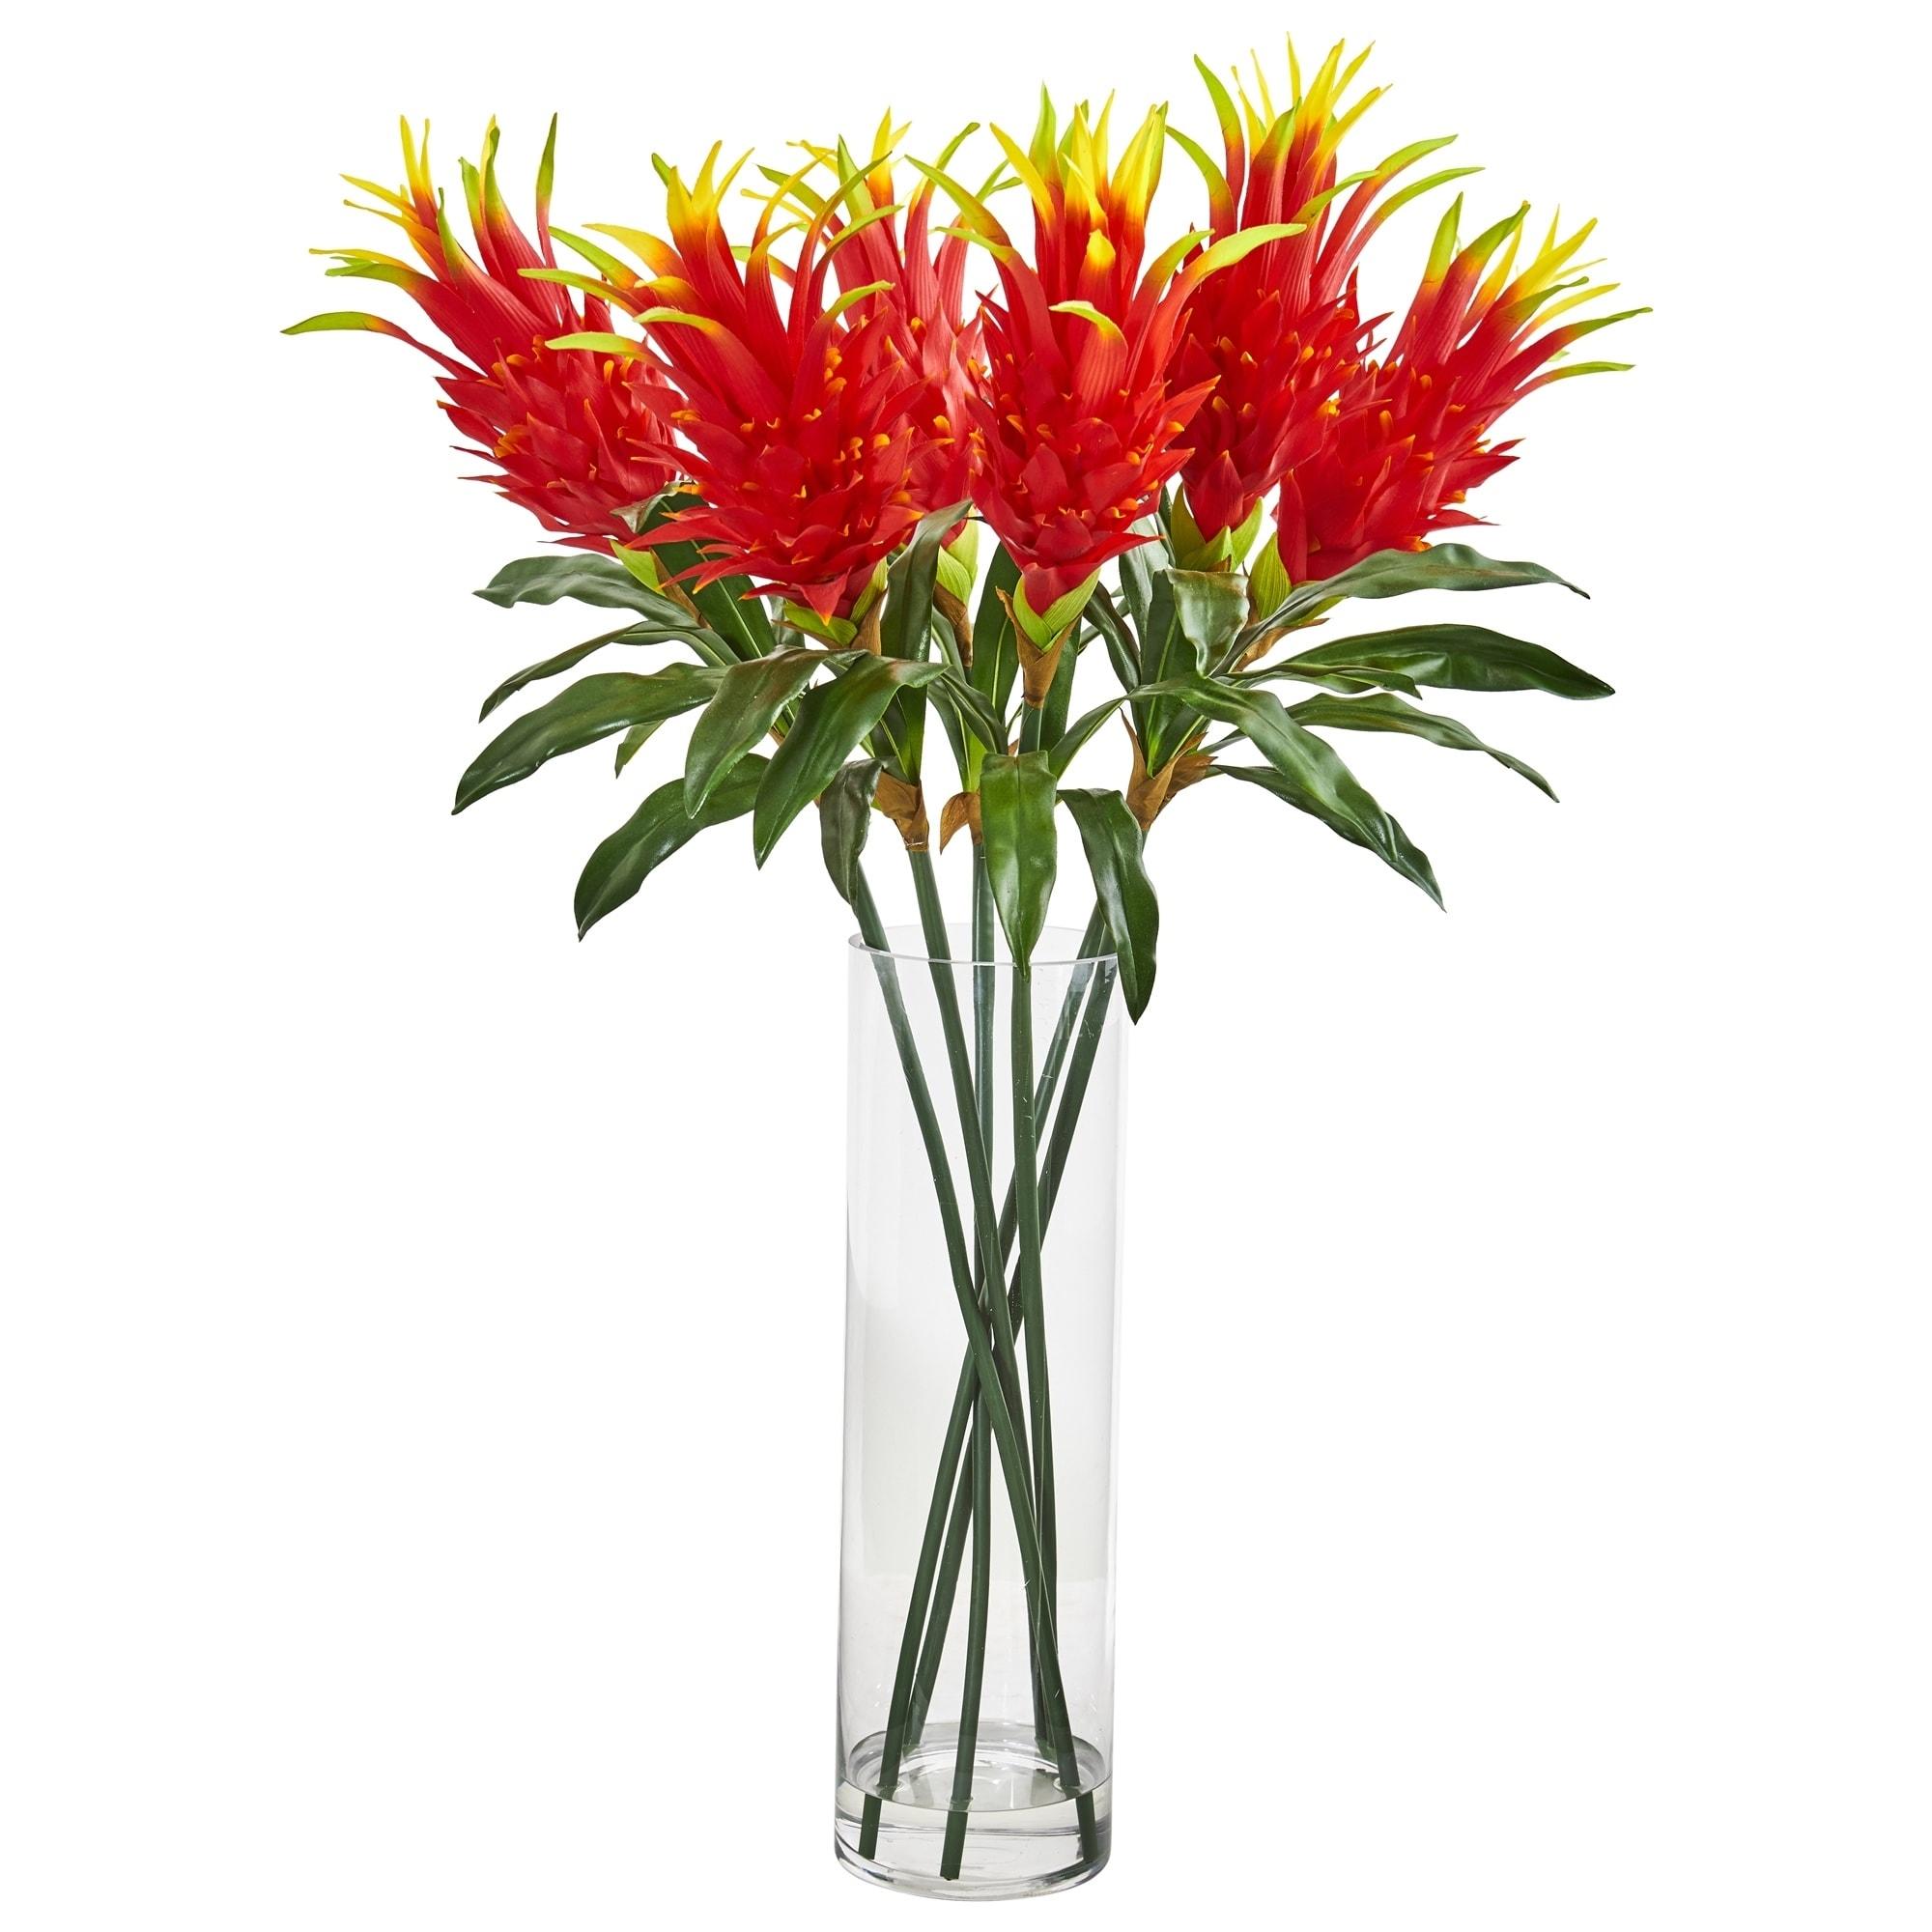 Dragon Fruit Flower Artificial Arrangement in Glass Vase